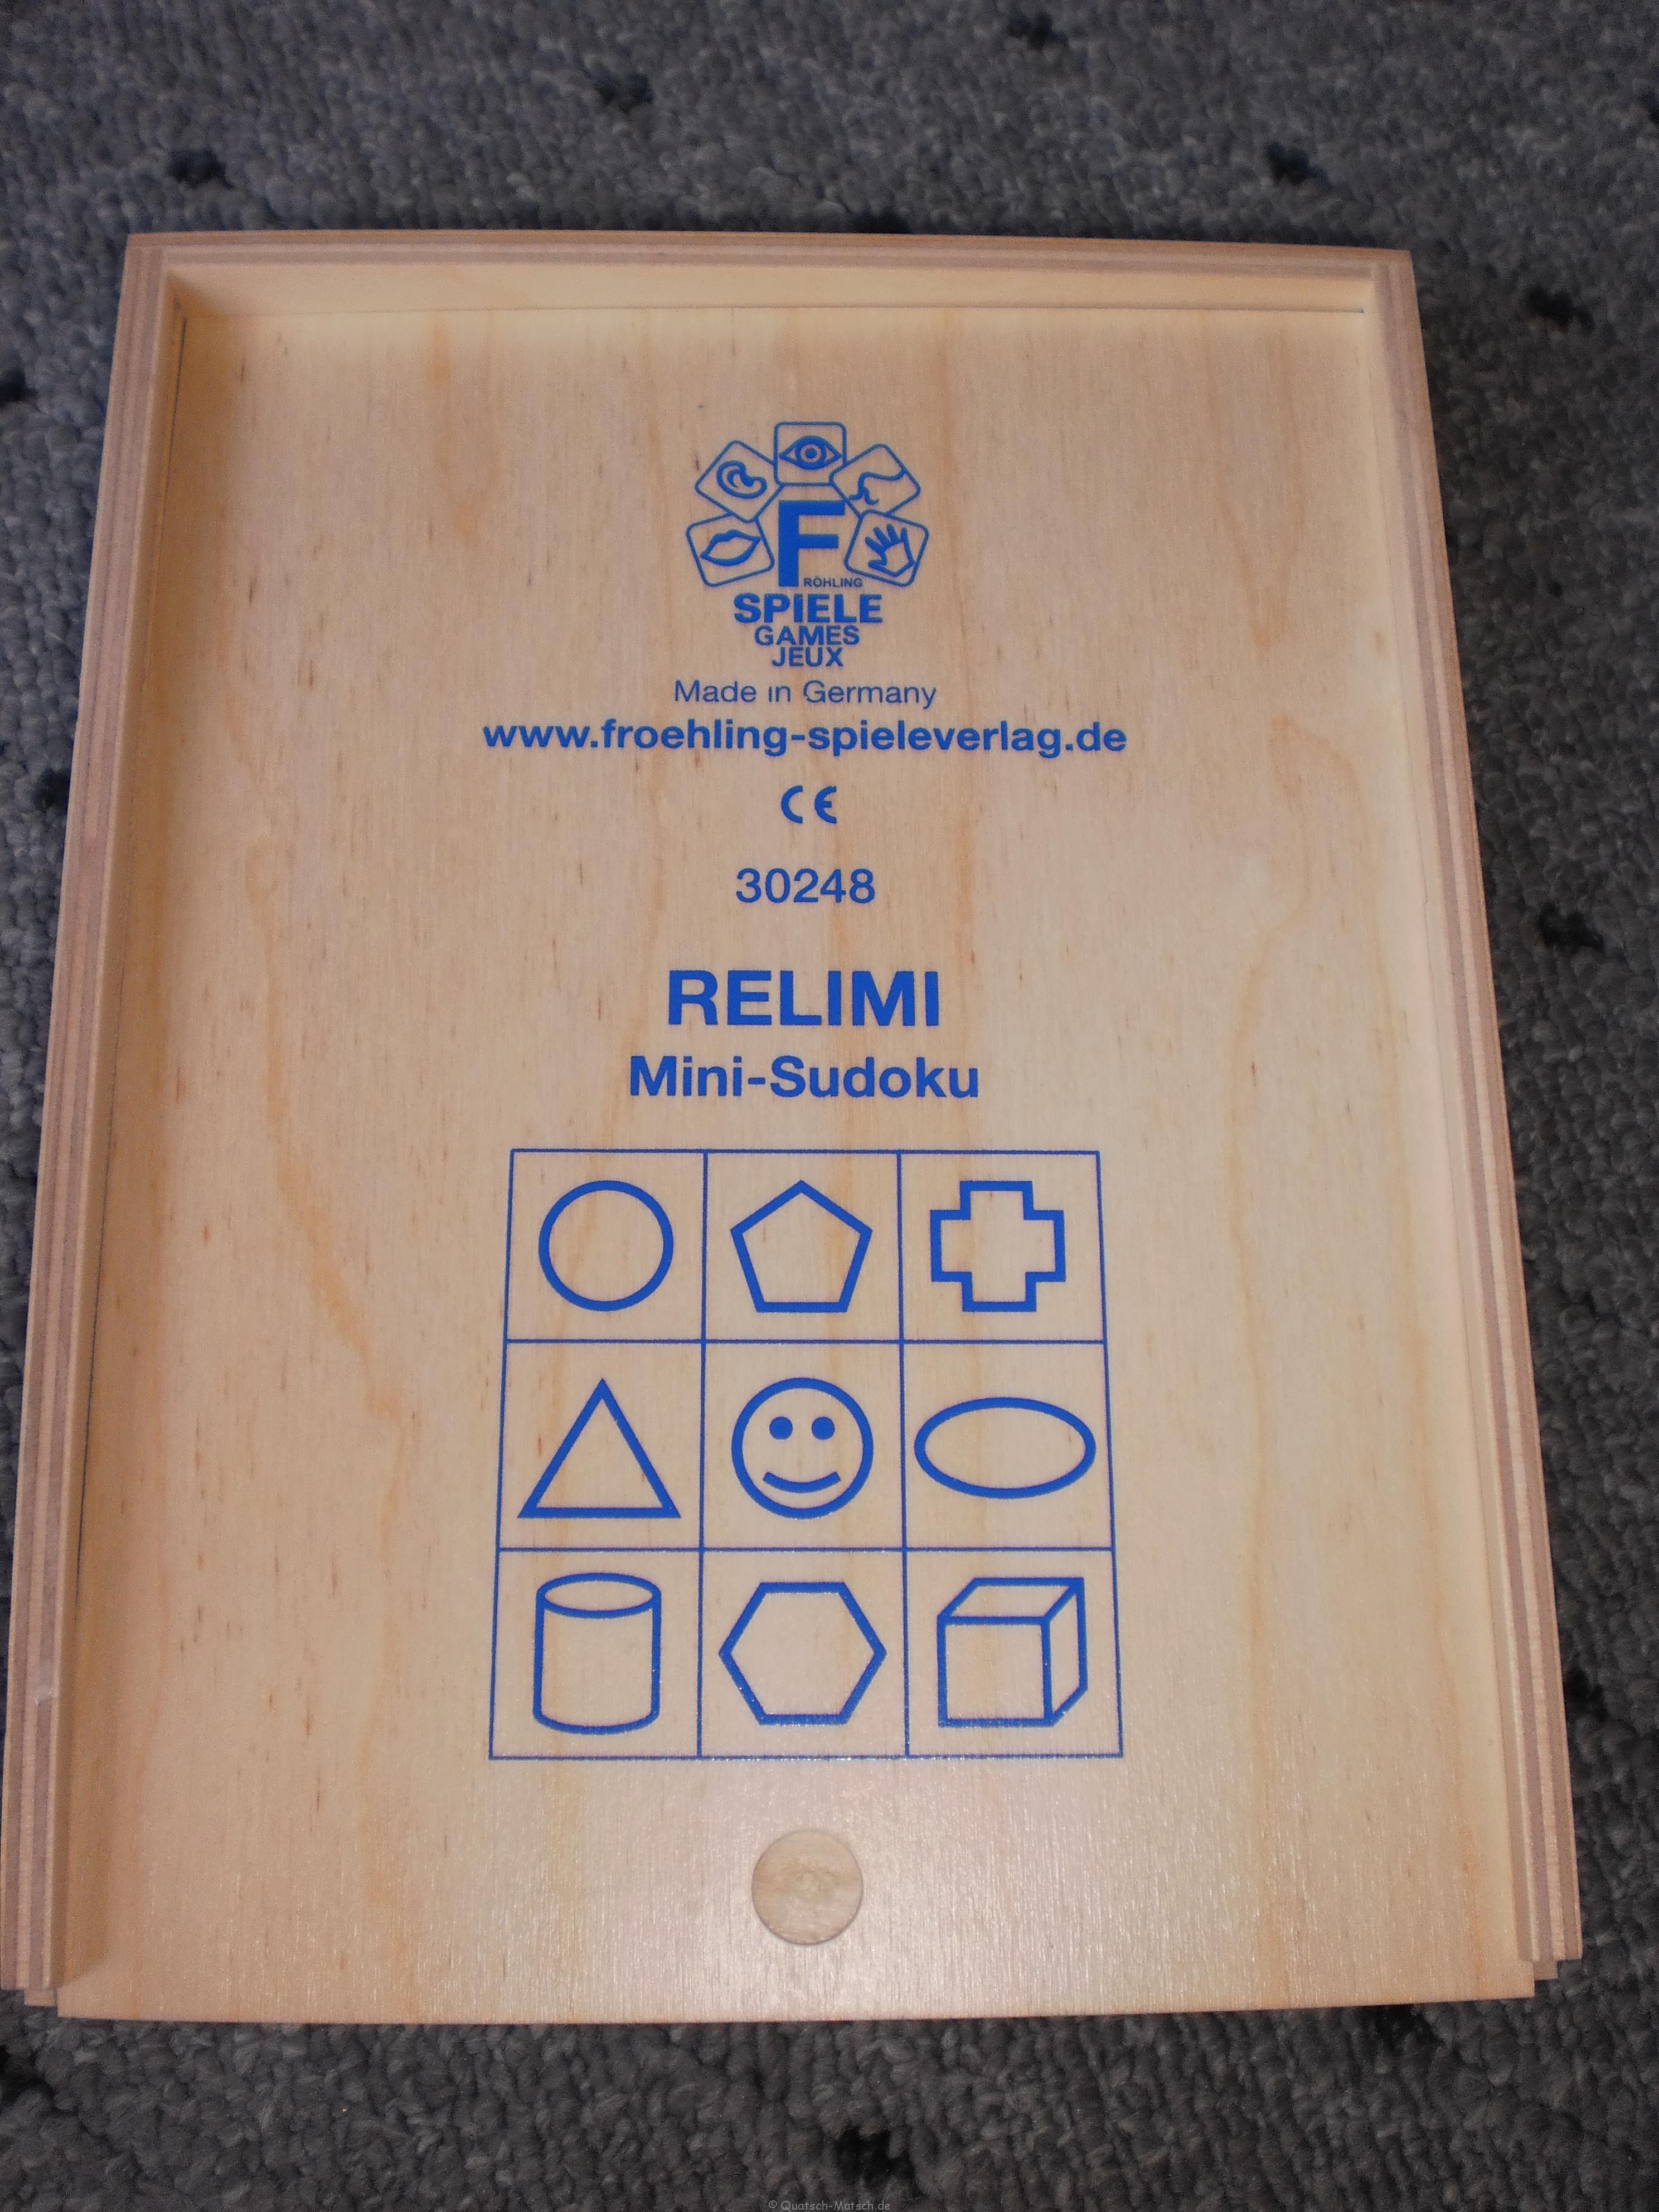 Mini Sudoku und Remili von Beleduc